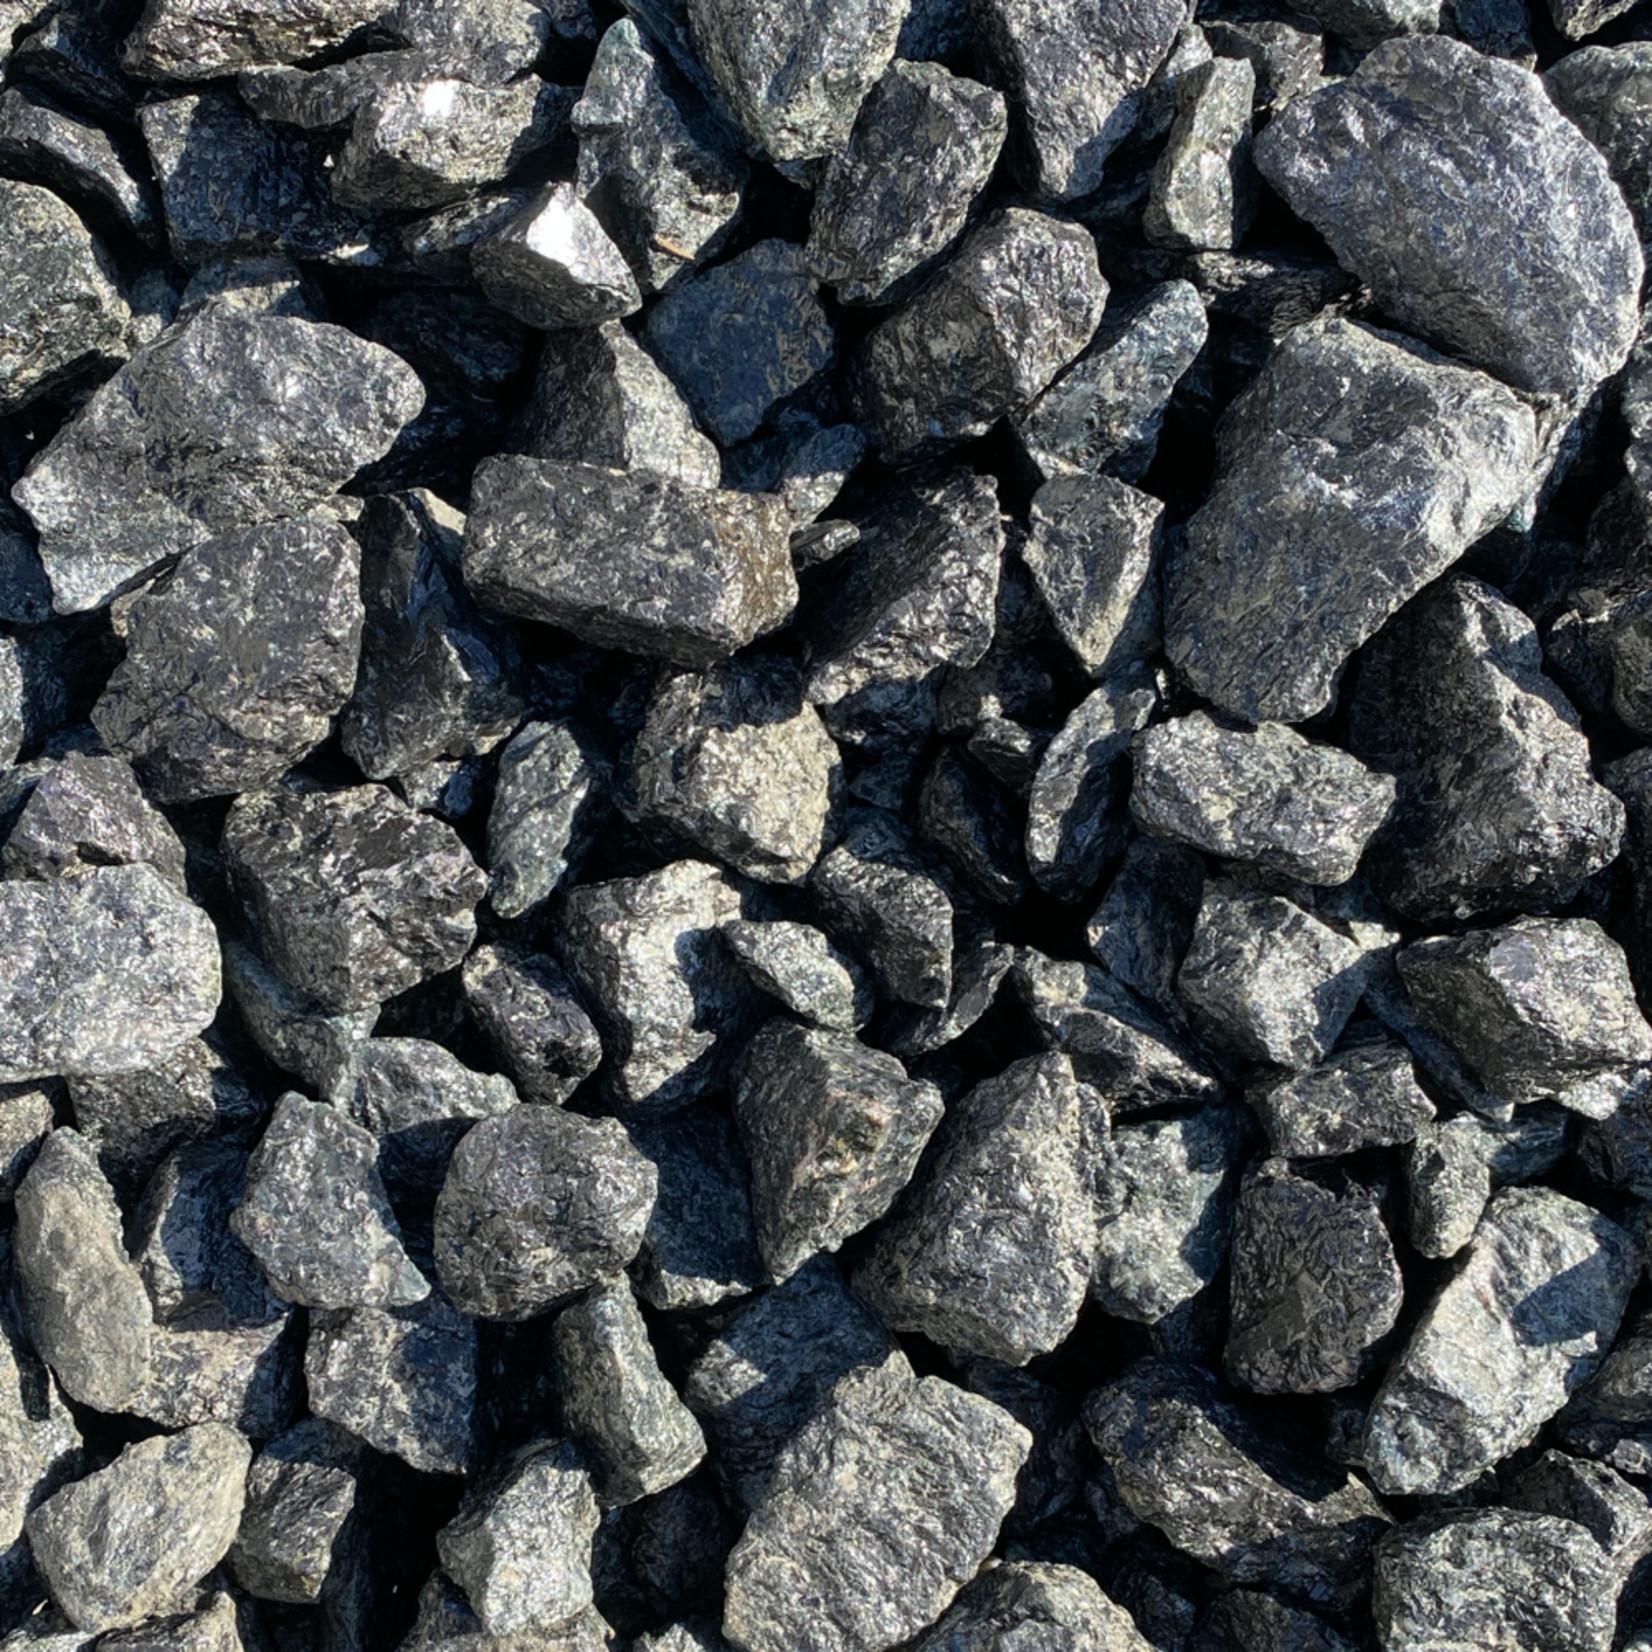 Black Granite (1 Ton)